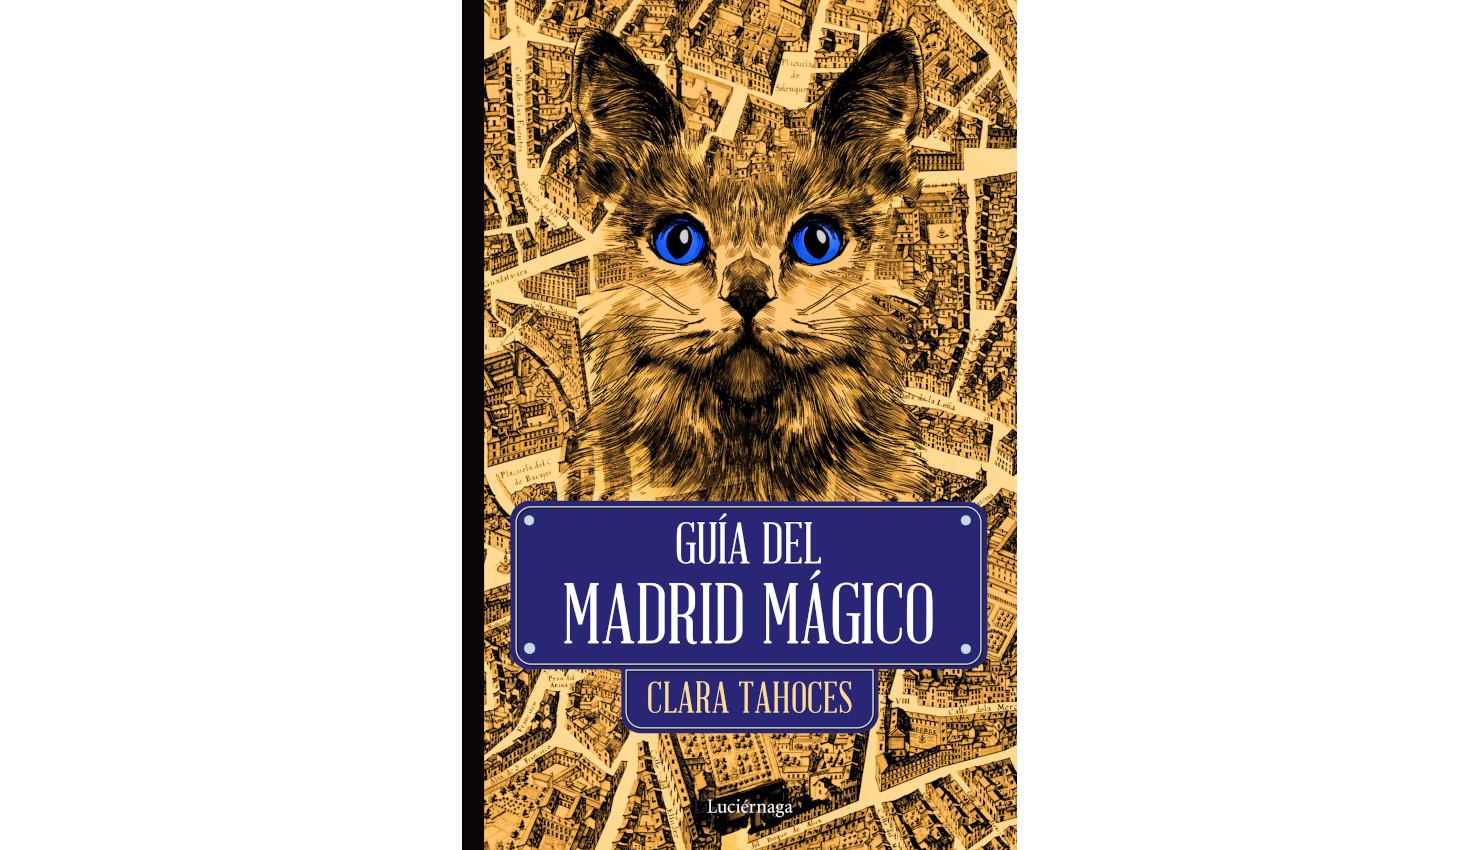 guiadelmadridmagico-claratahoces-magazinehorse